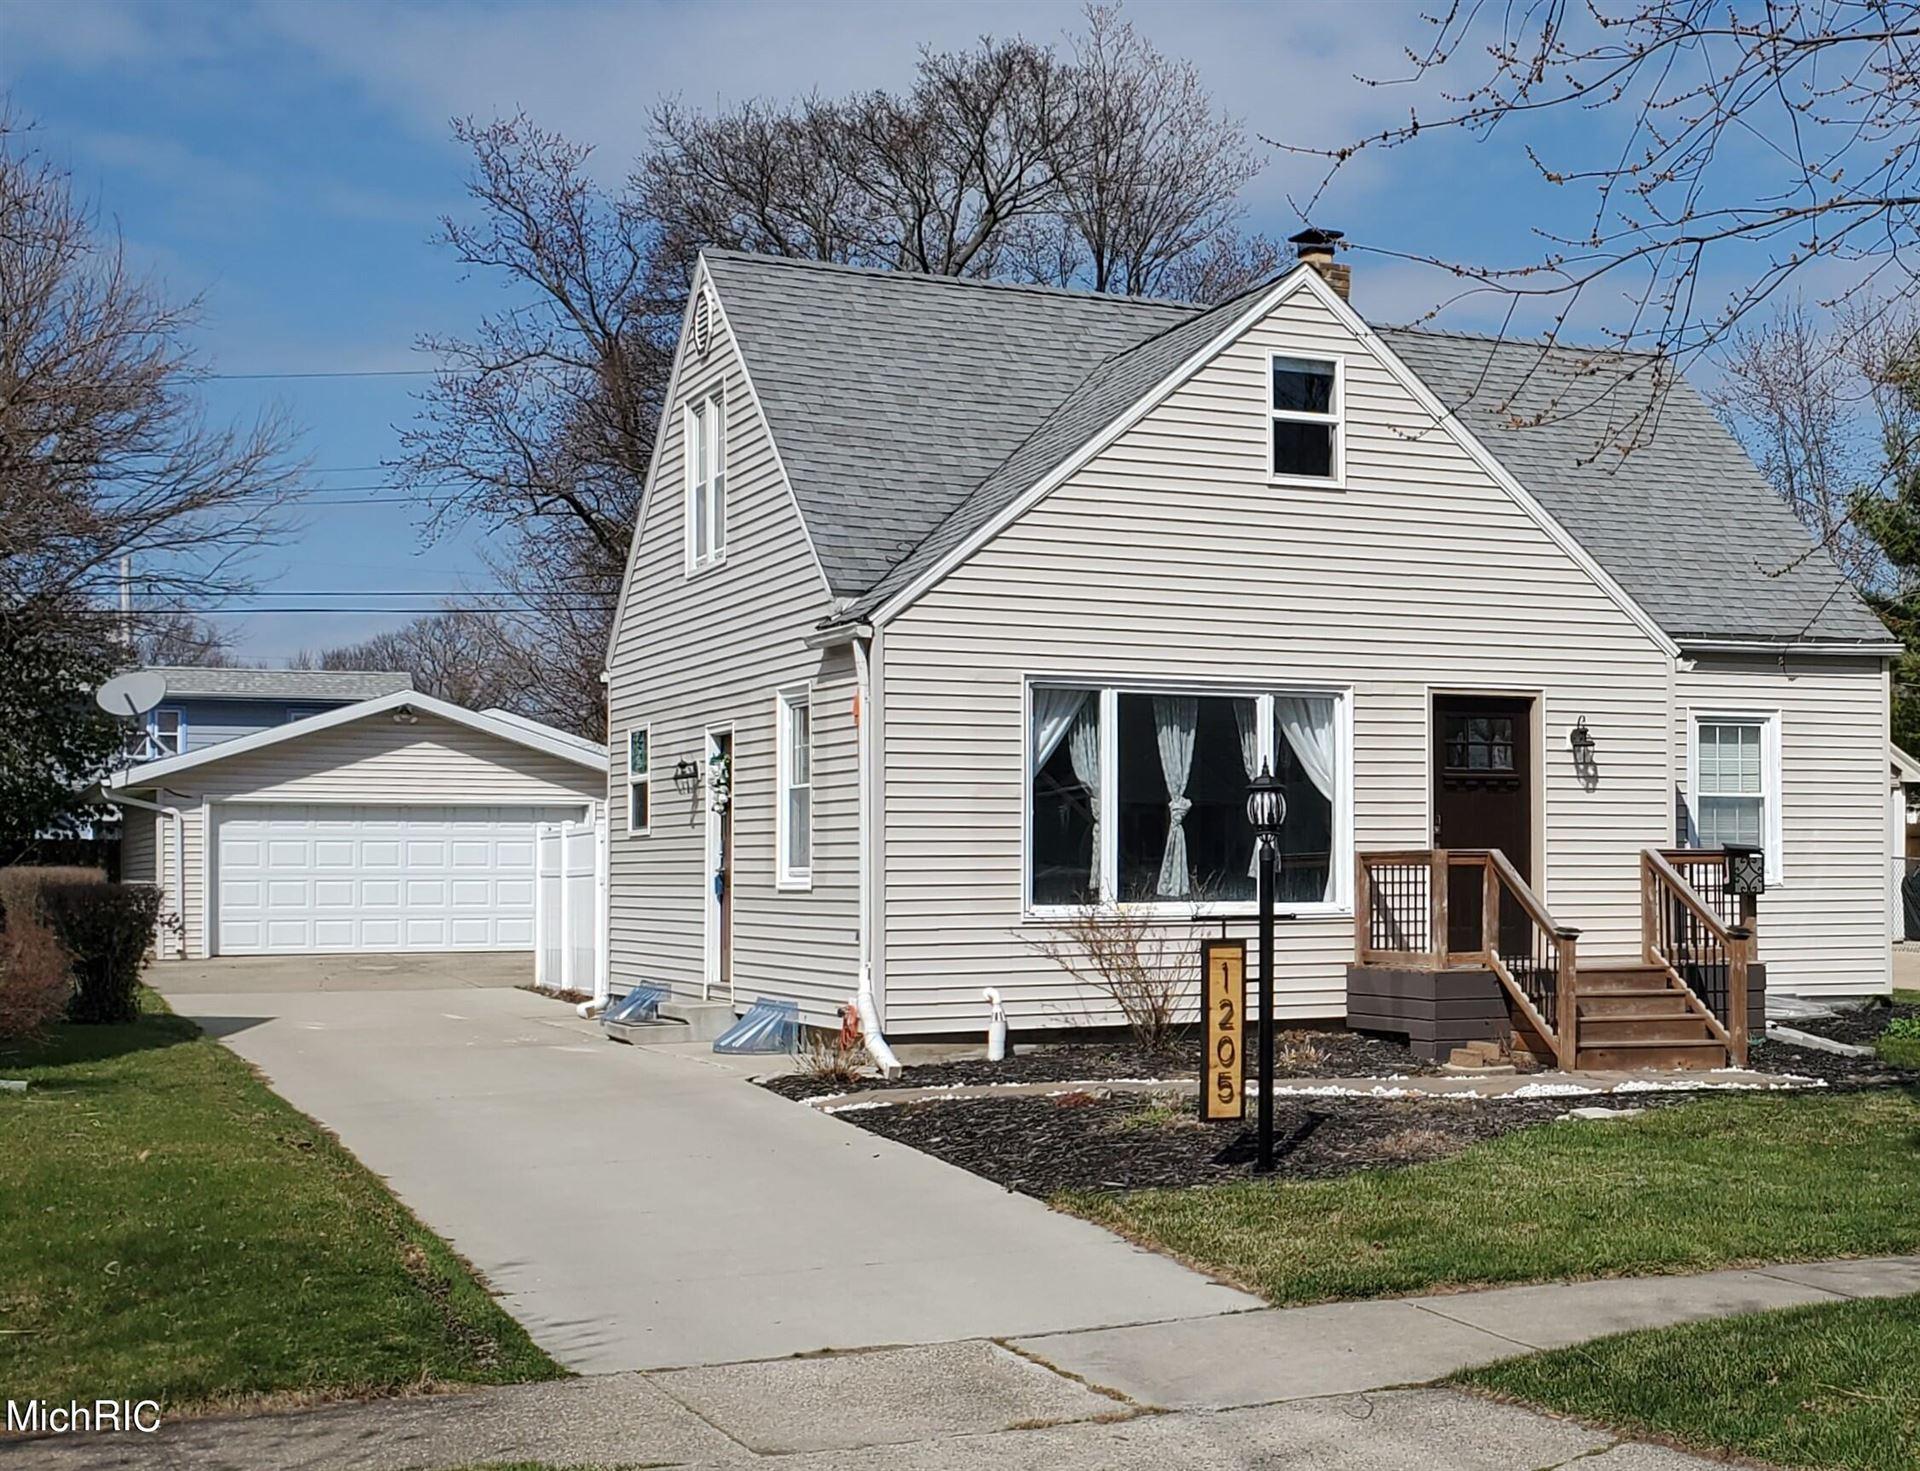 1205 Mohawk Lane, Saint Joseph, MI 49085 - MLS#: 21010356